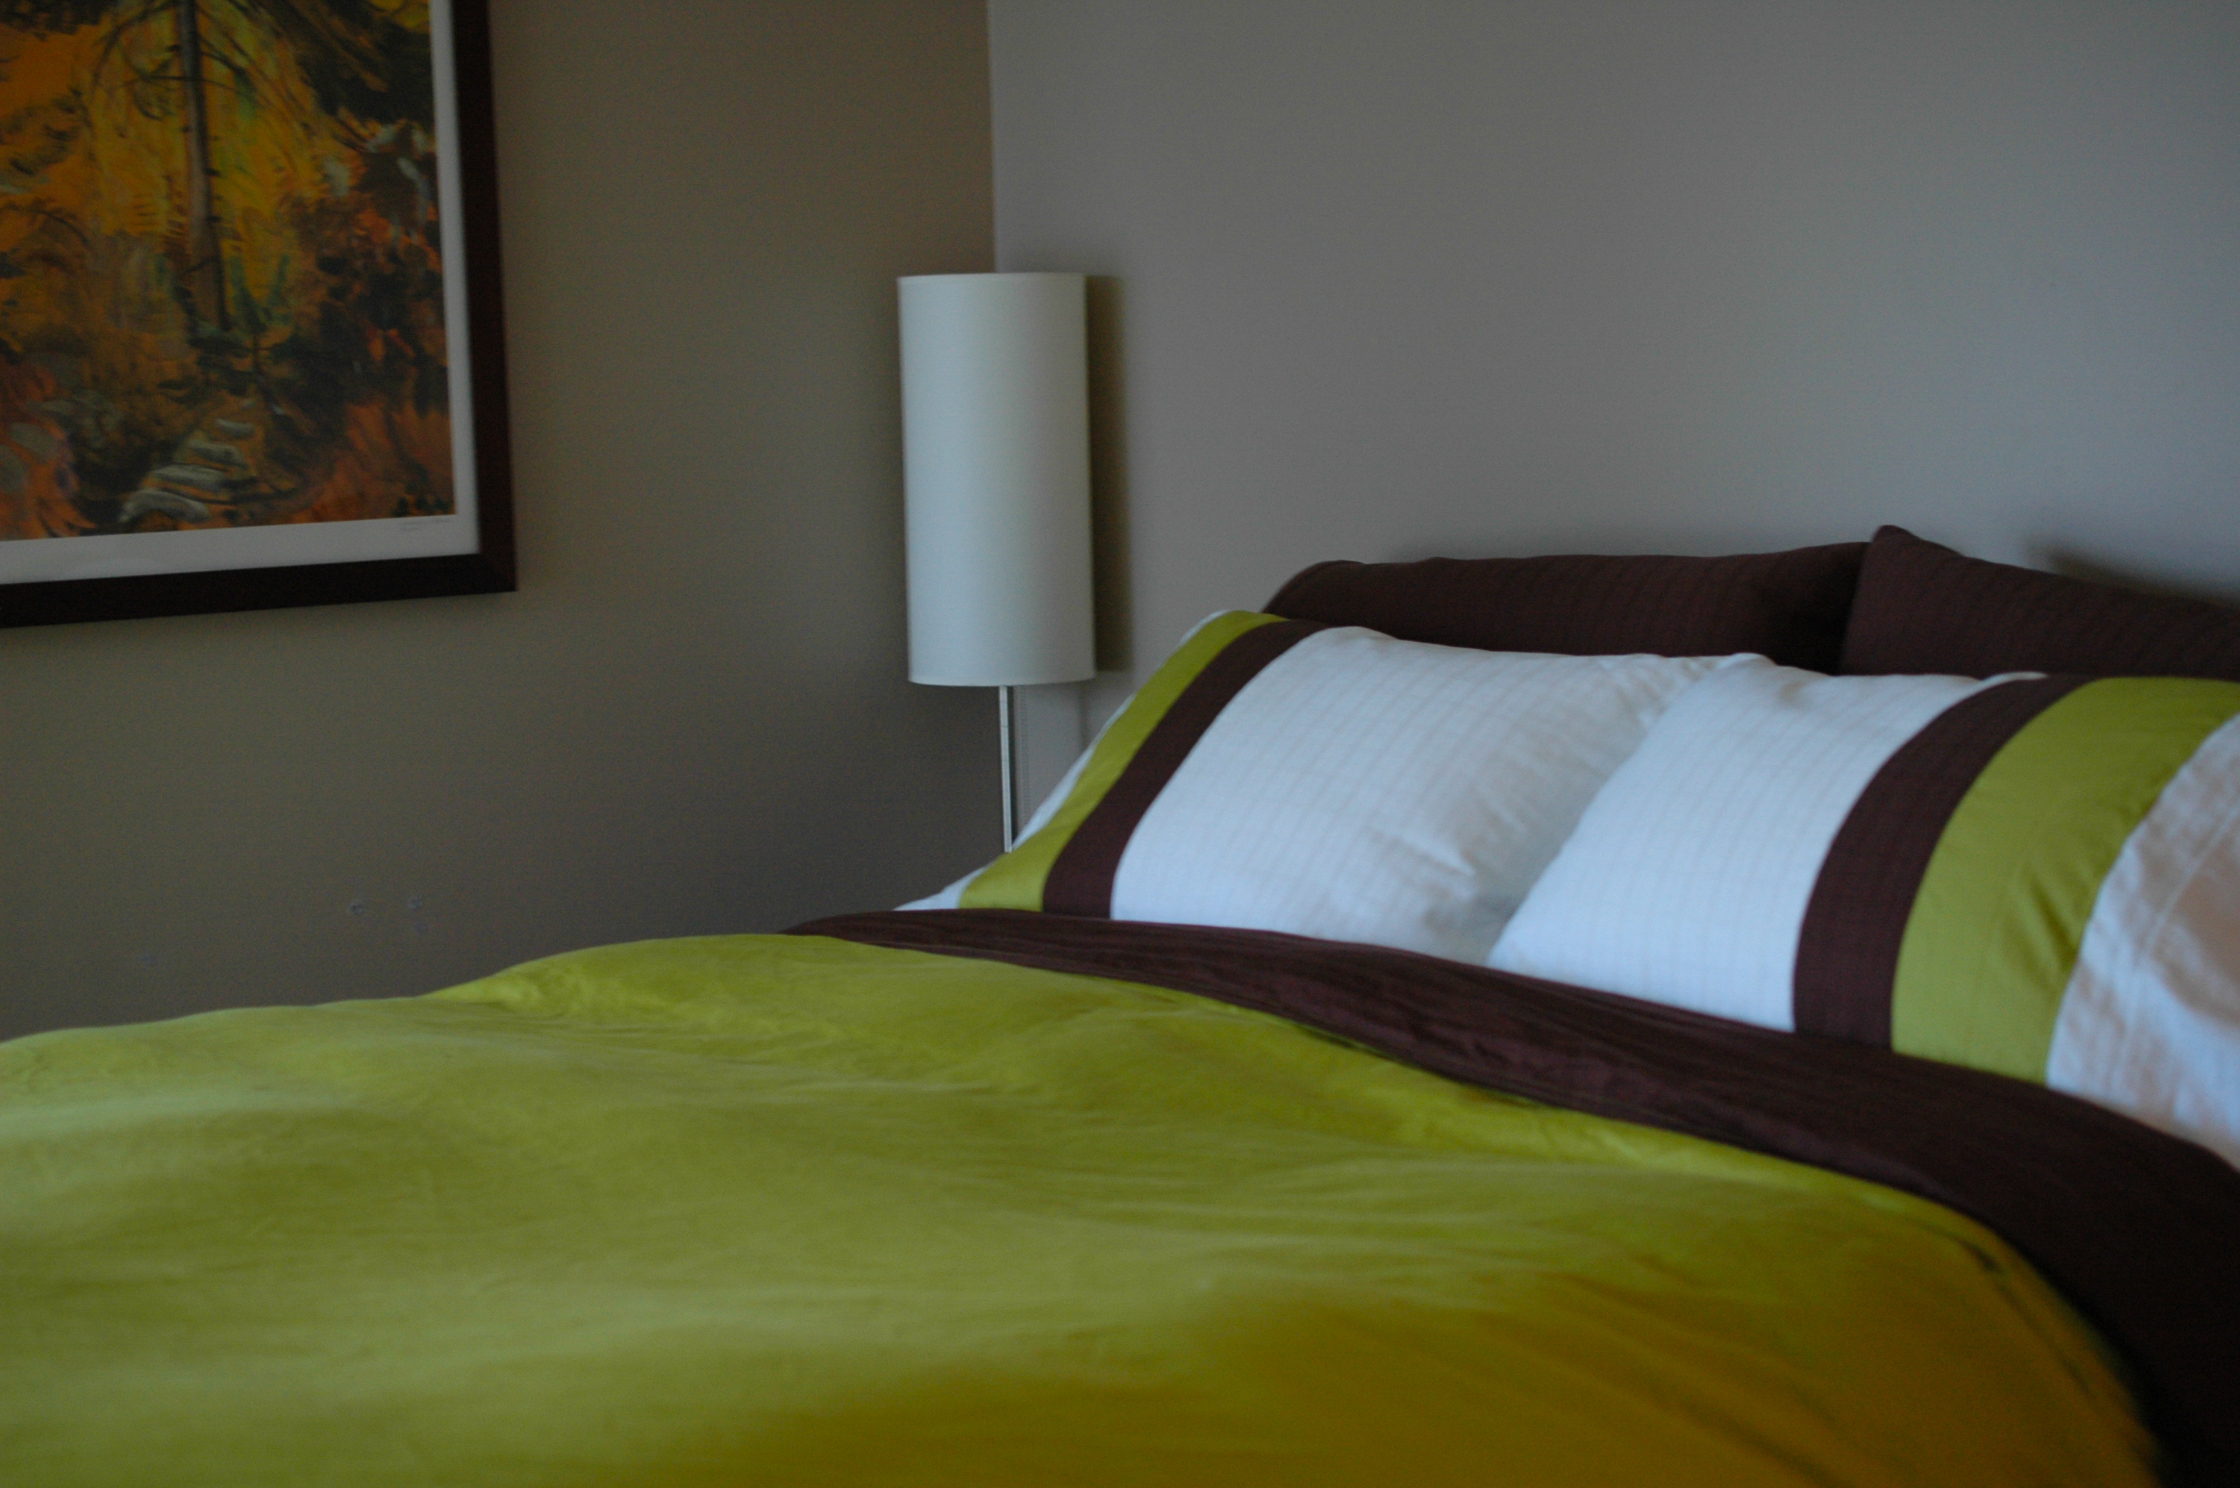 DIY Duvet Cover and Pillow Shams